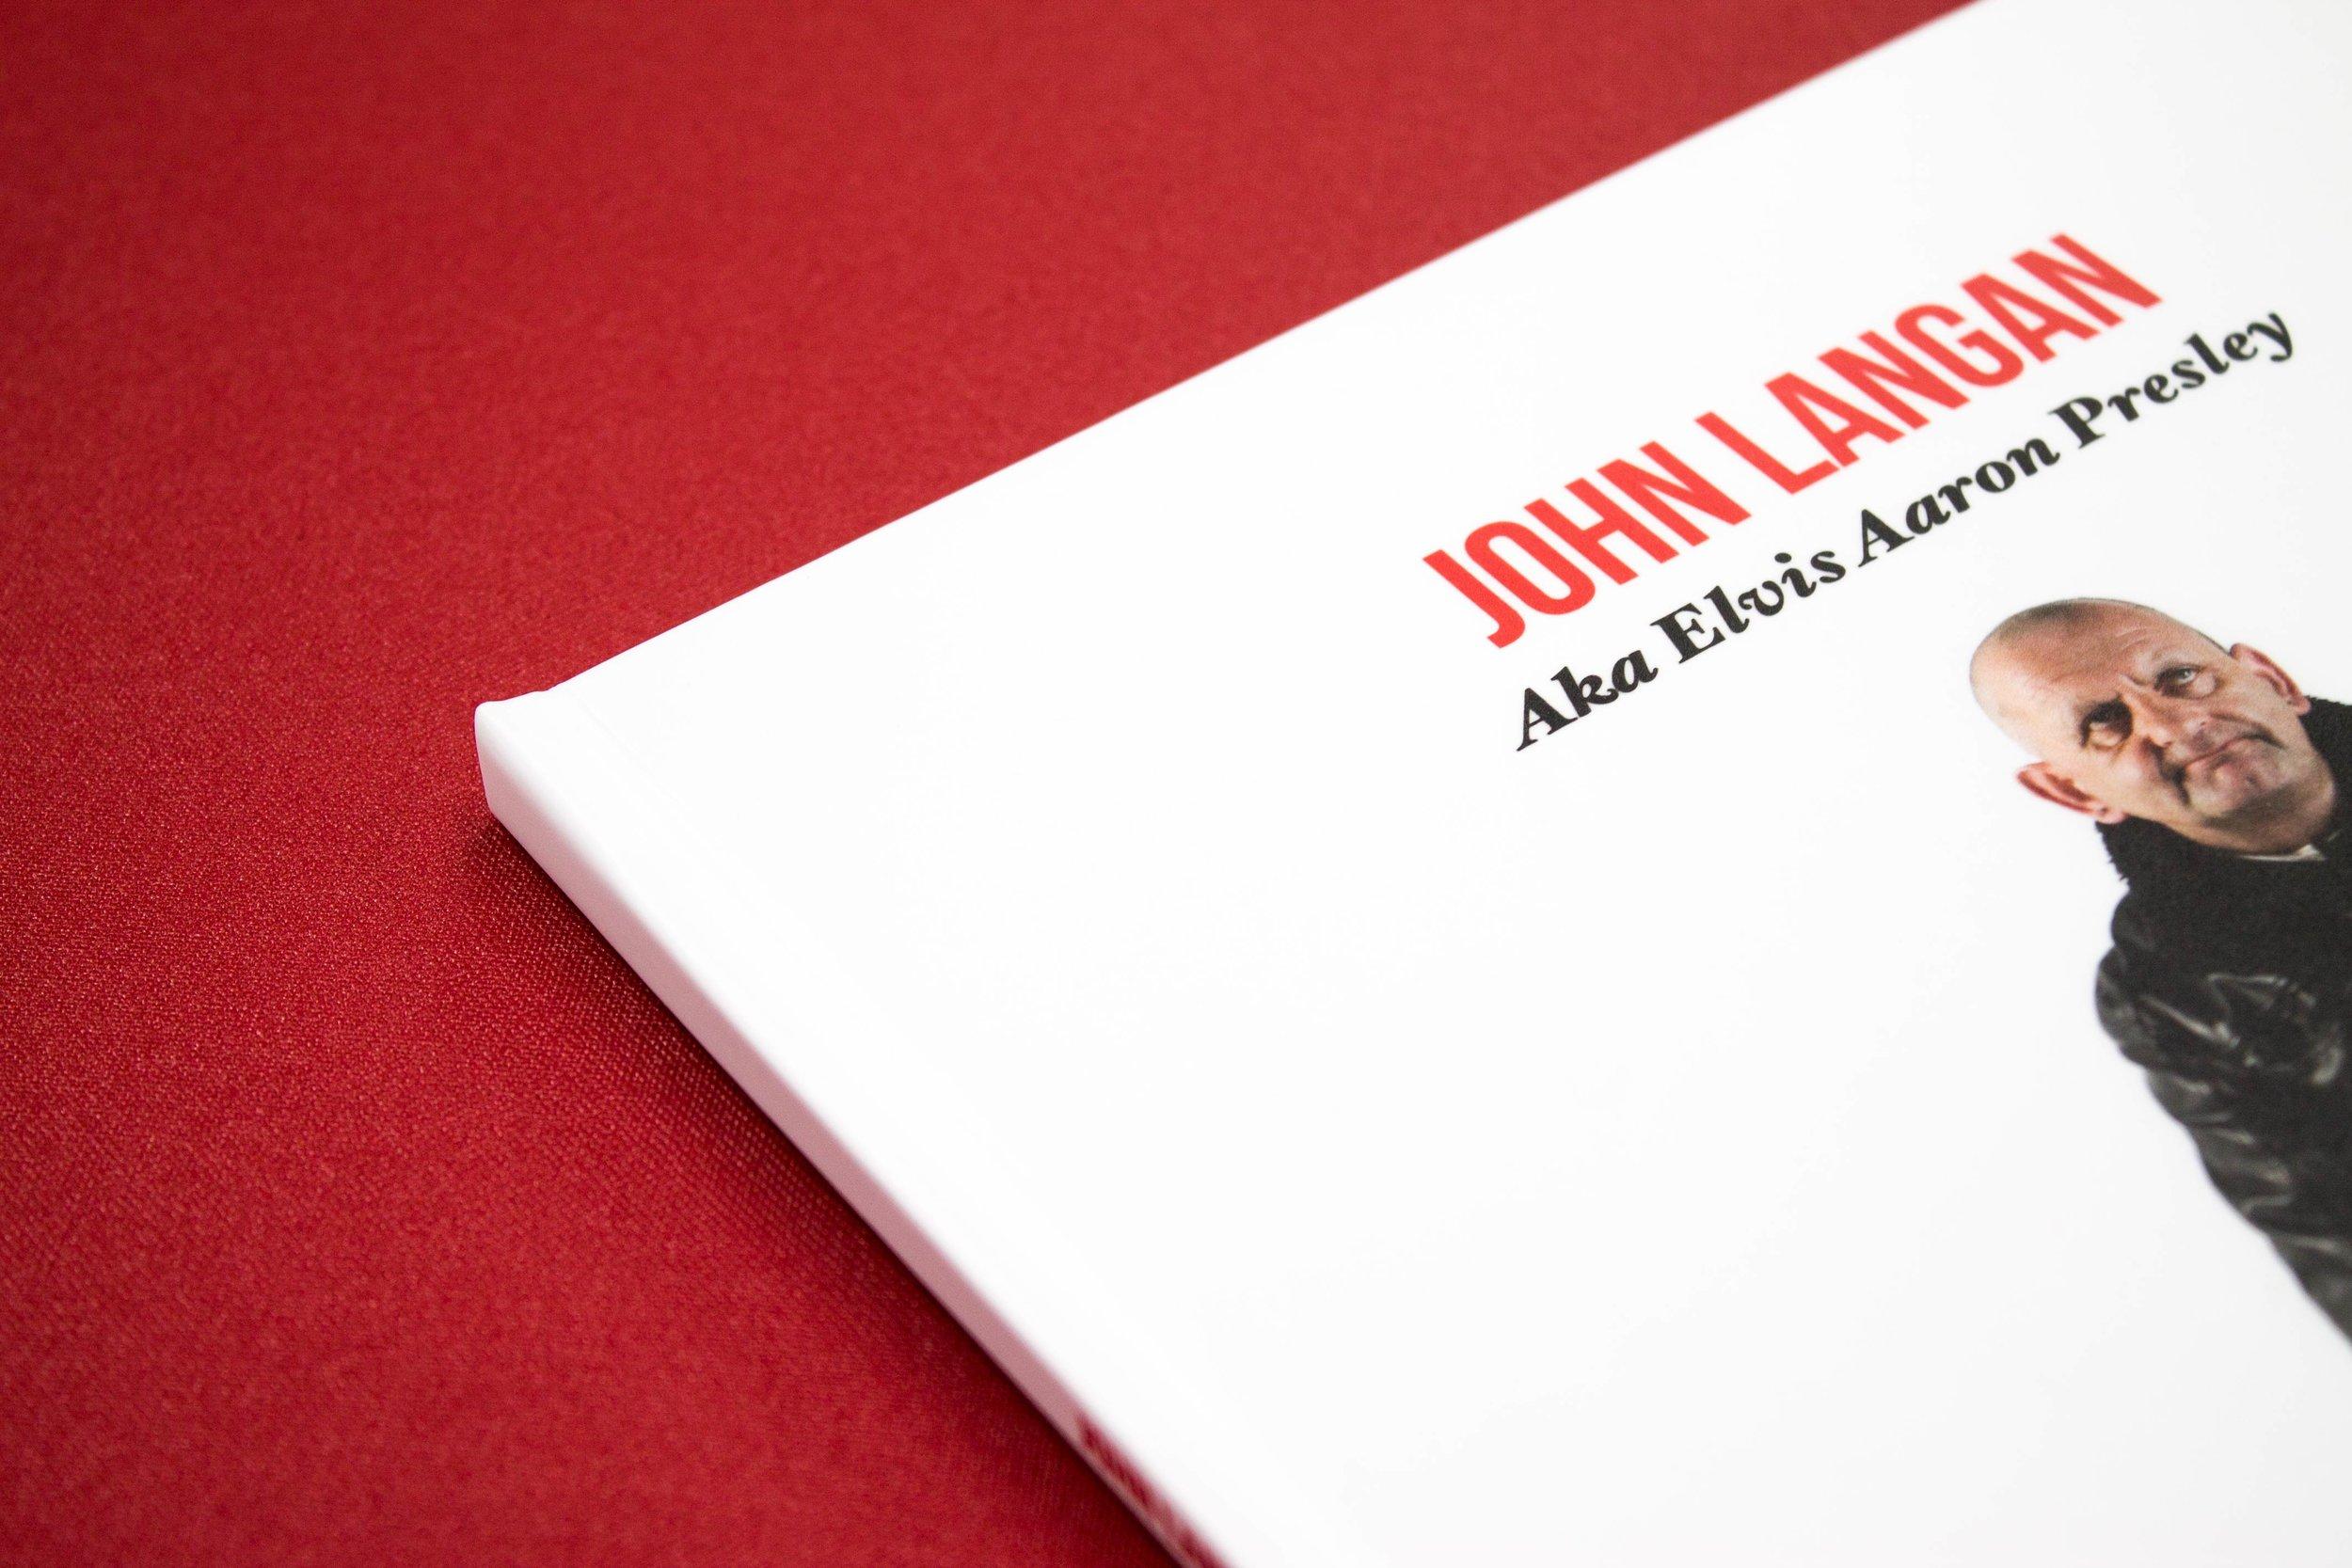 Small run book laminated cover